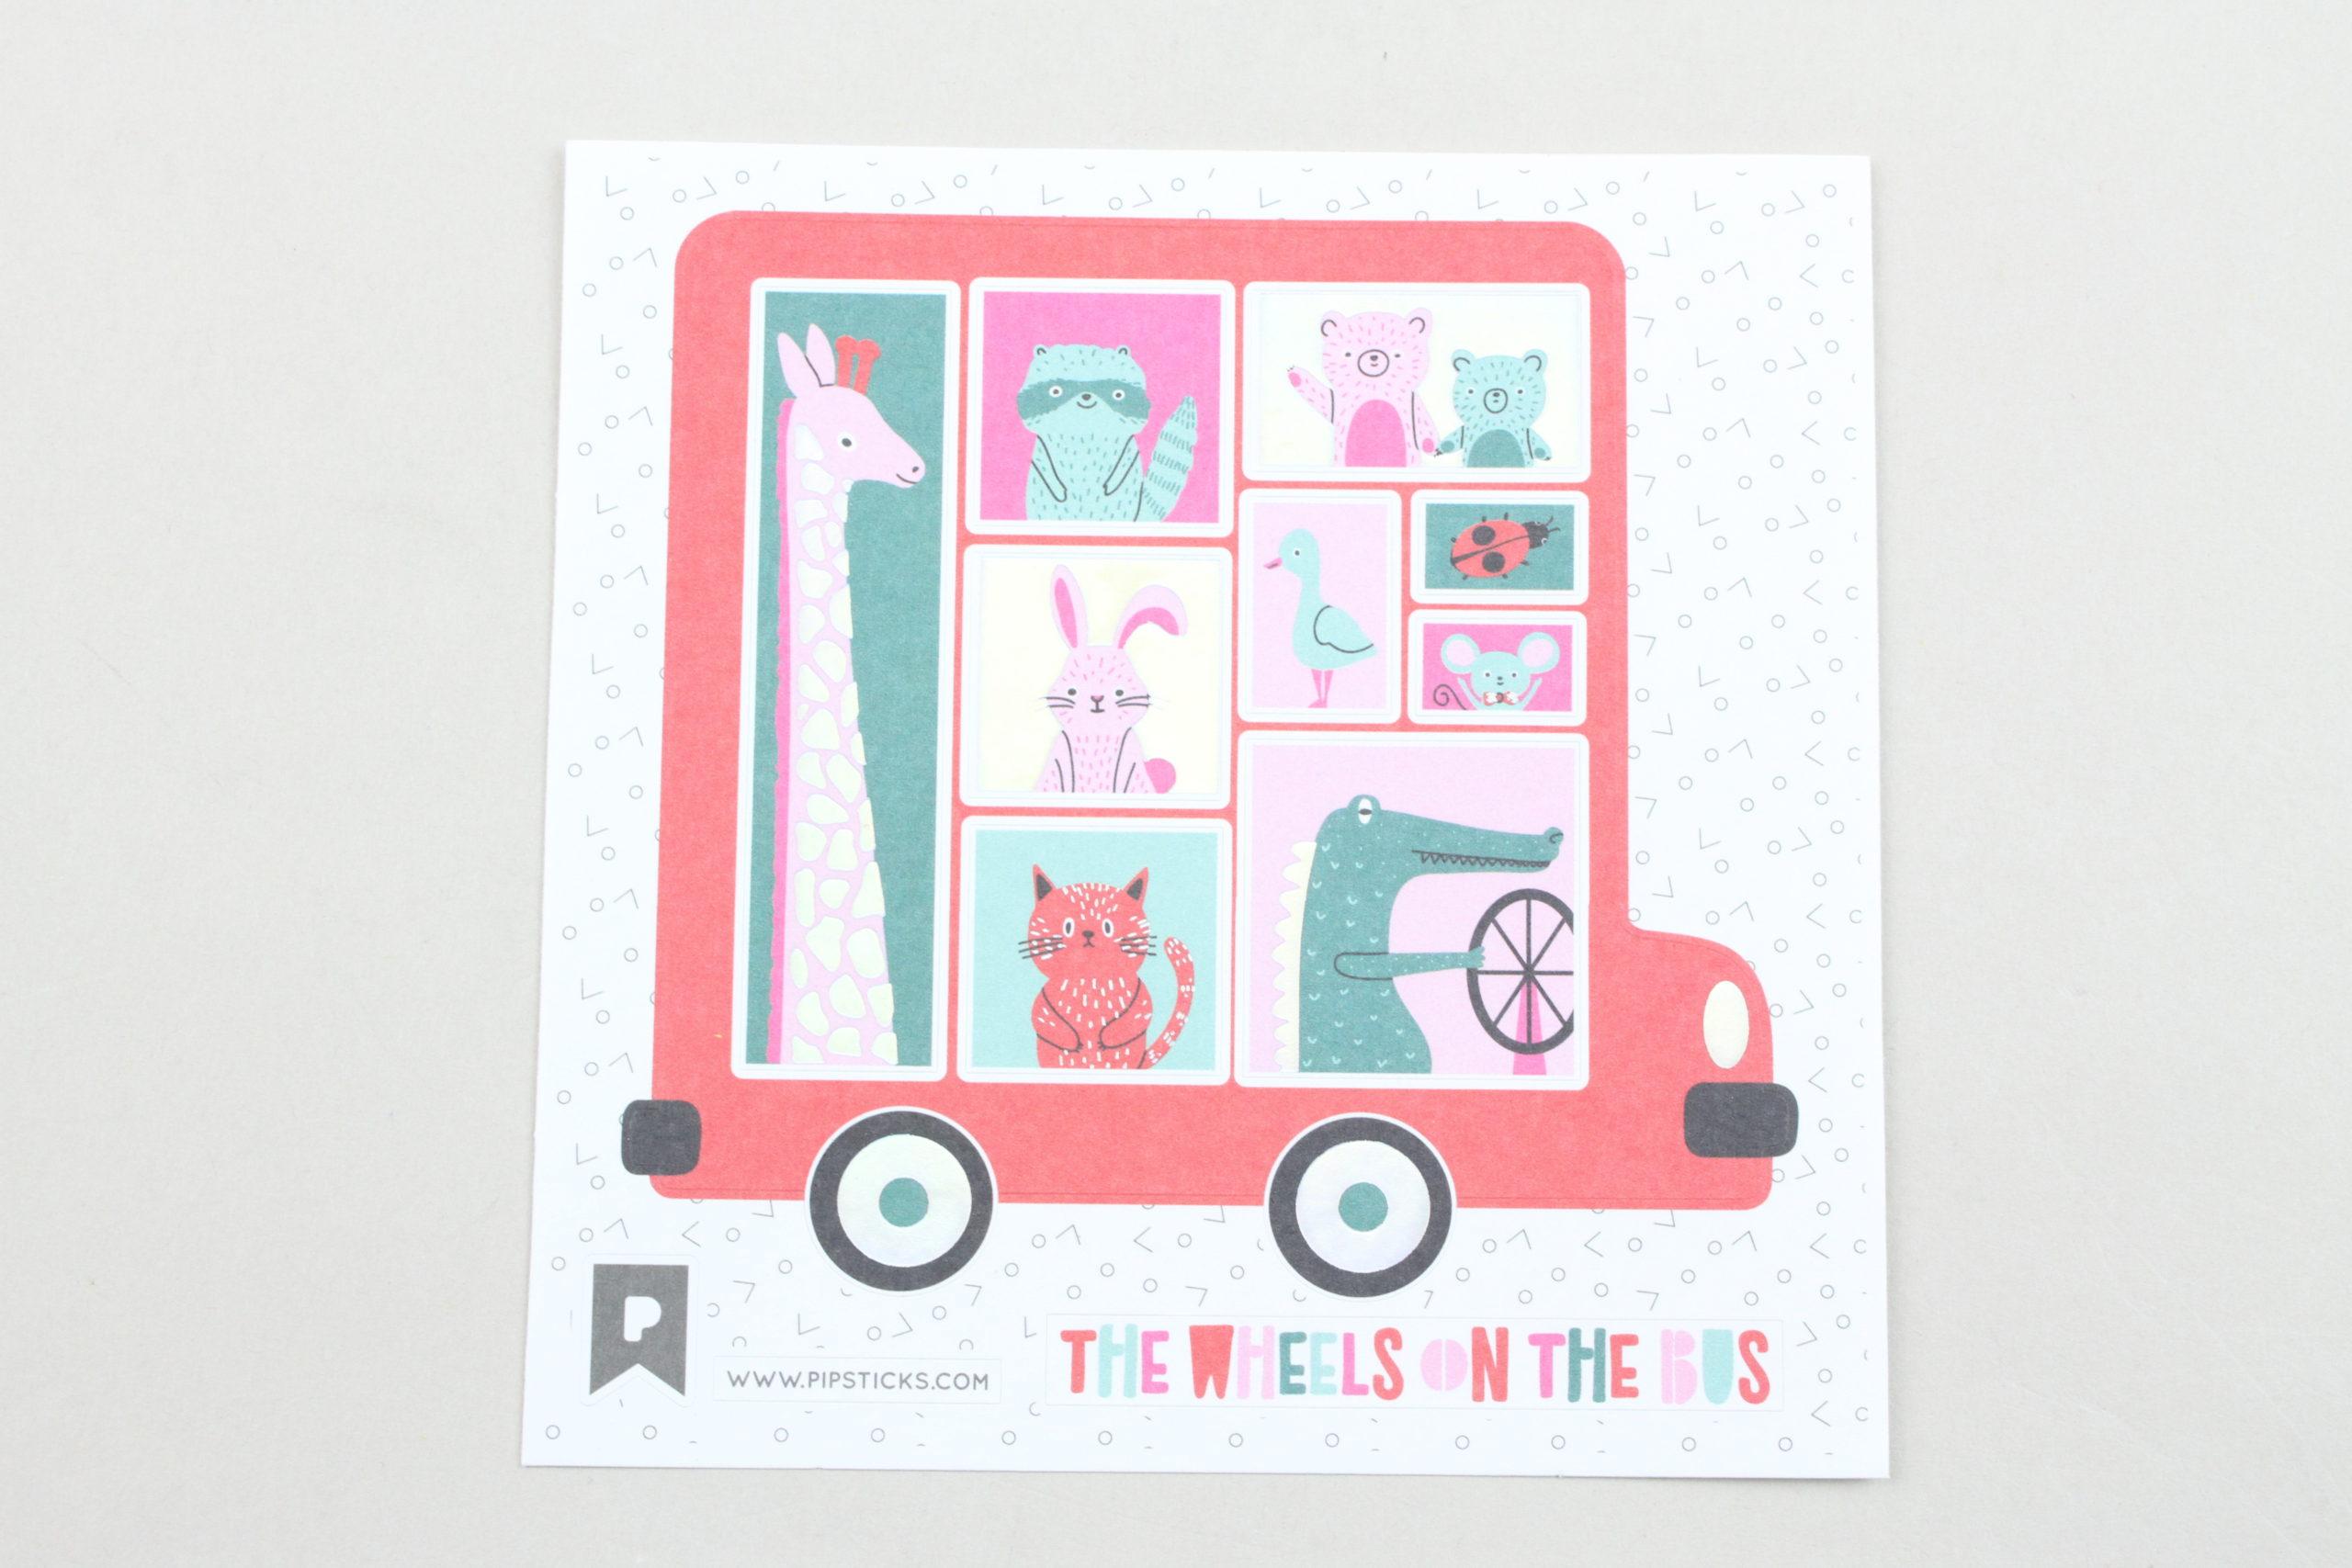 Wheels On The Bus Sticker